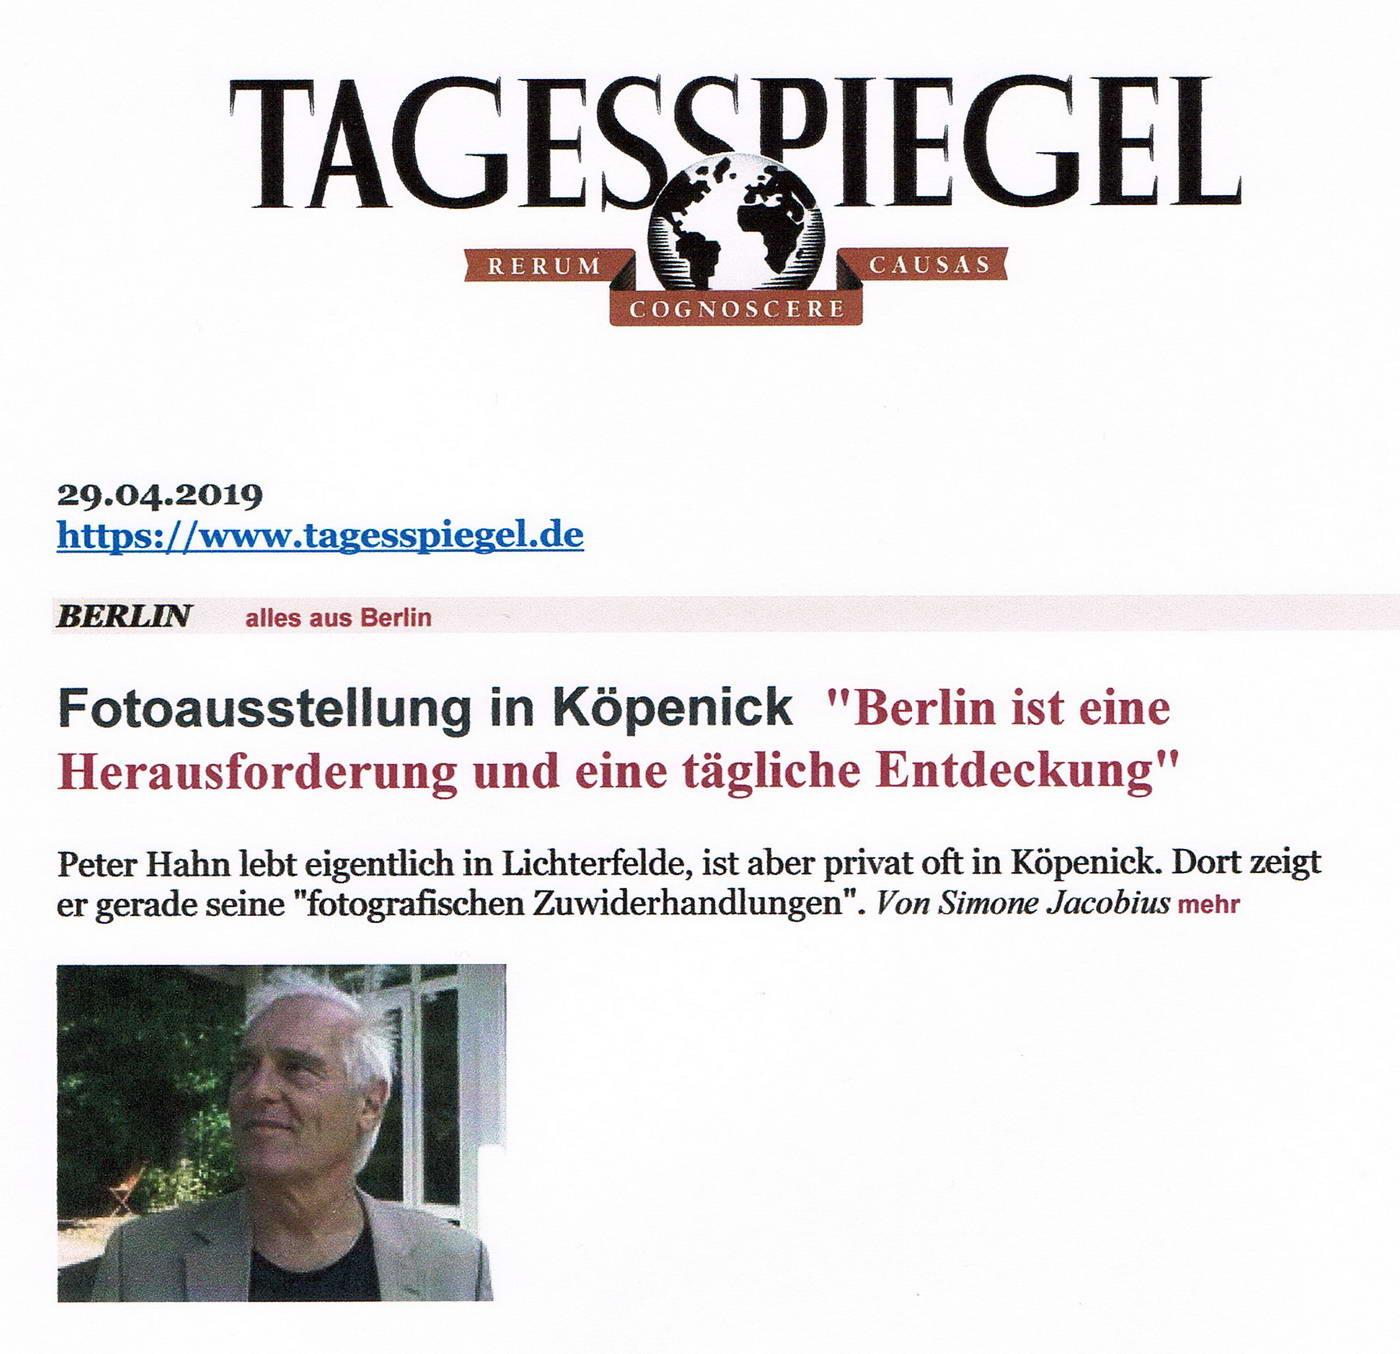 Tagesspiegel Schmetterlingshorst 01 konv